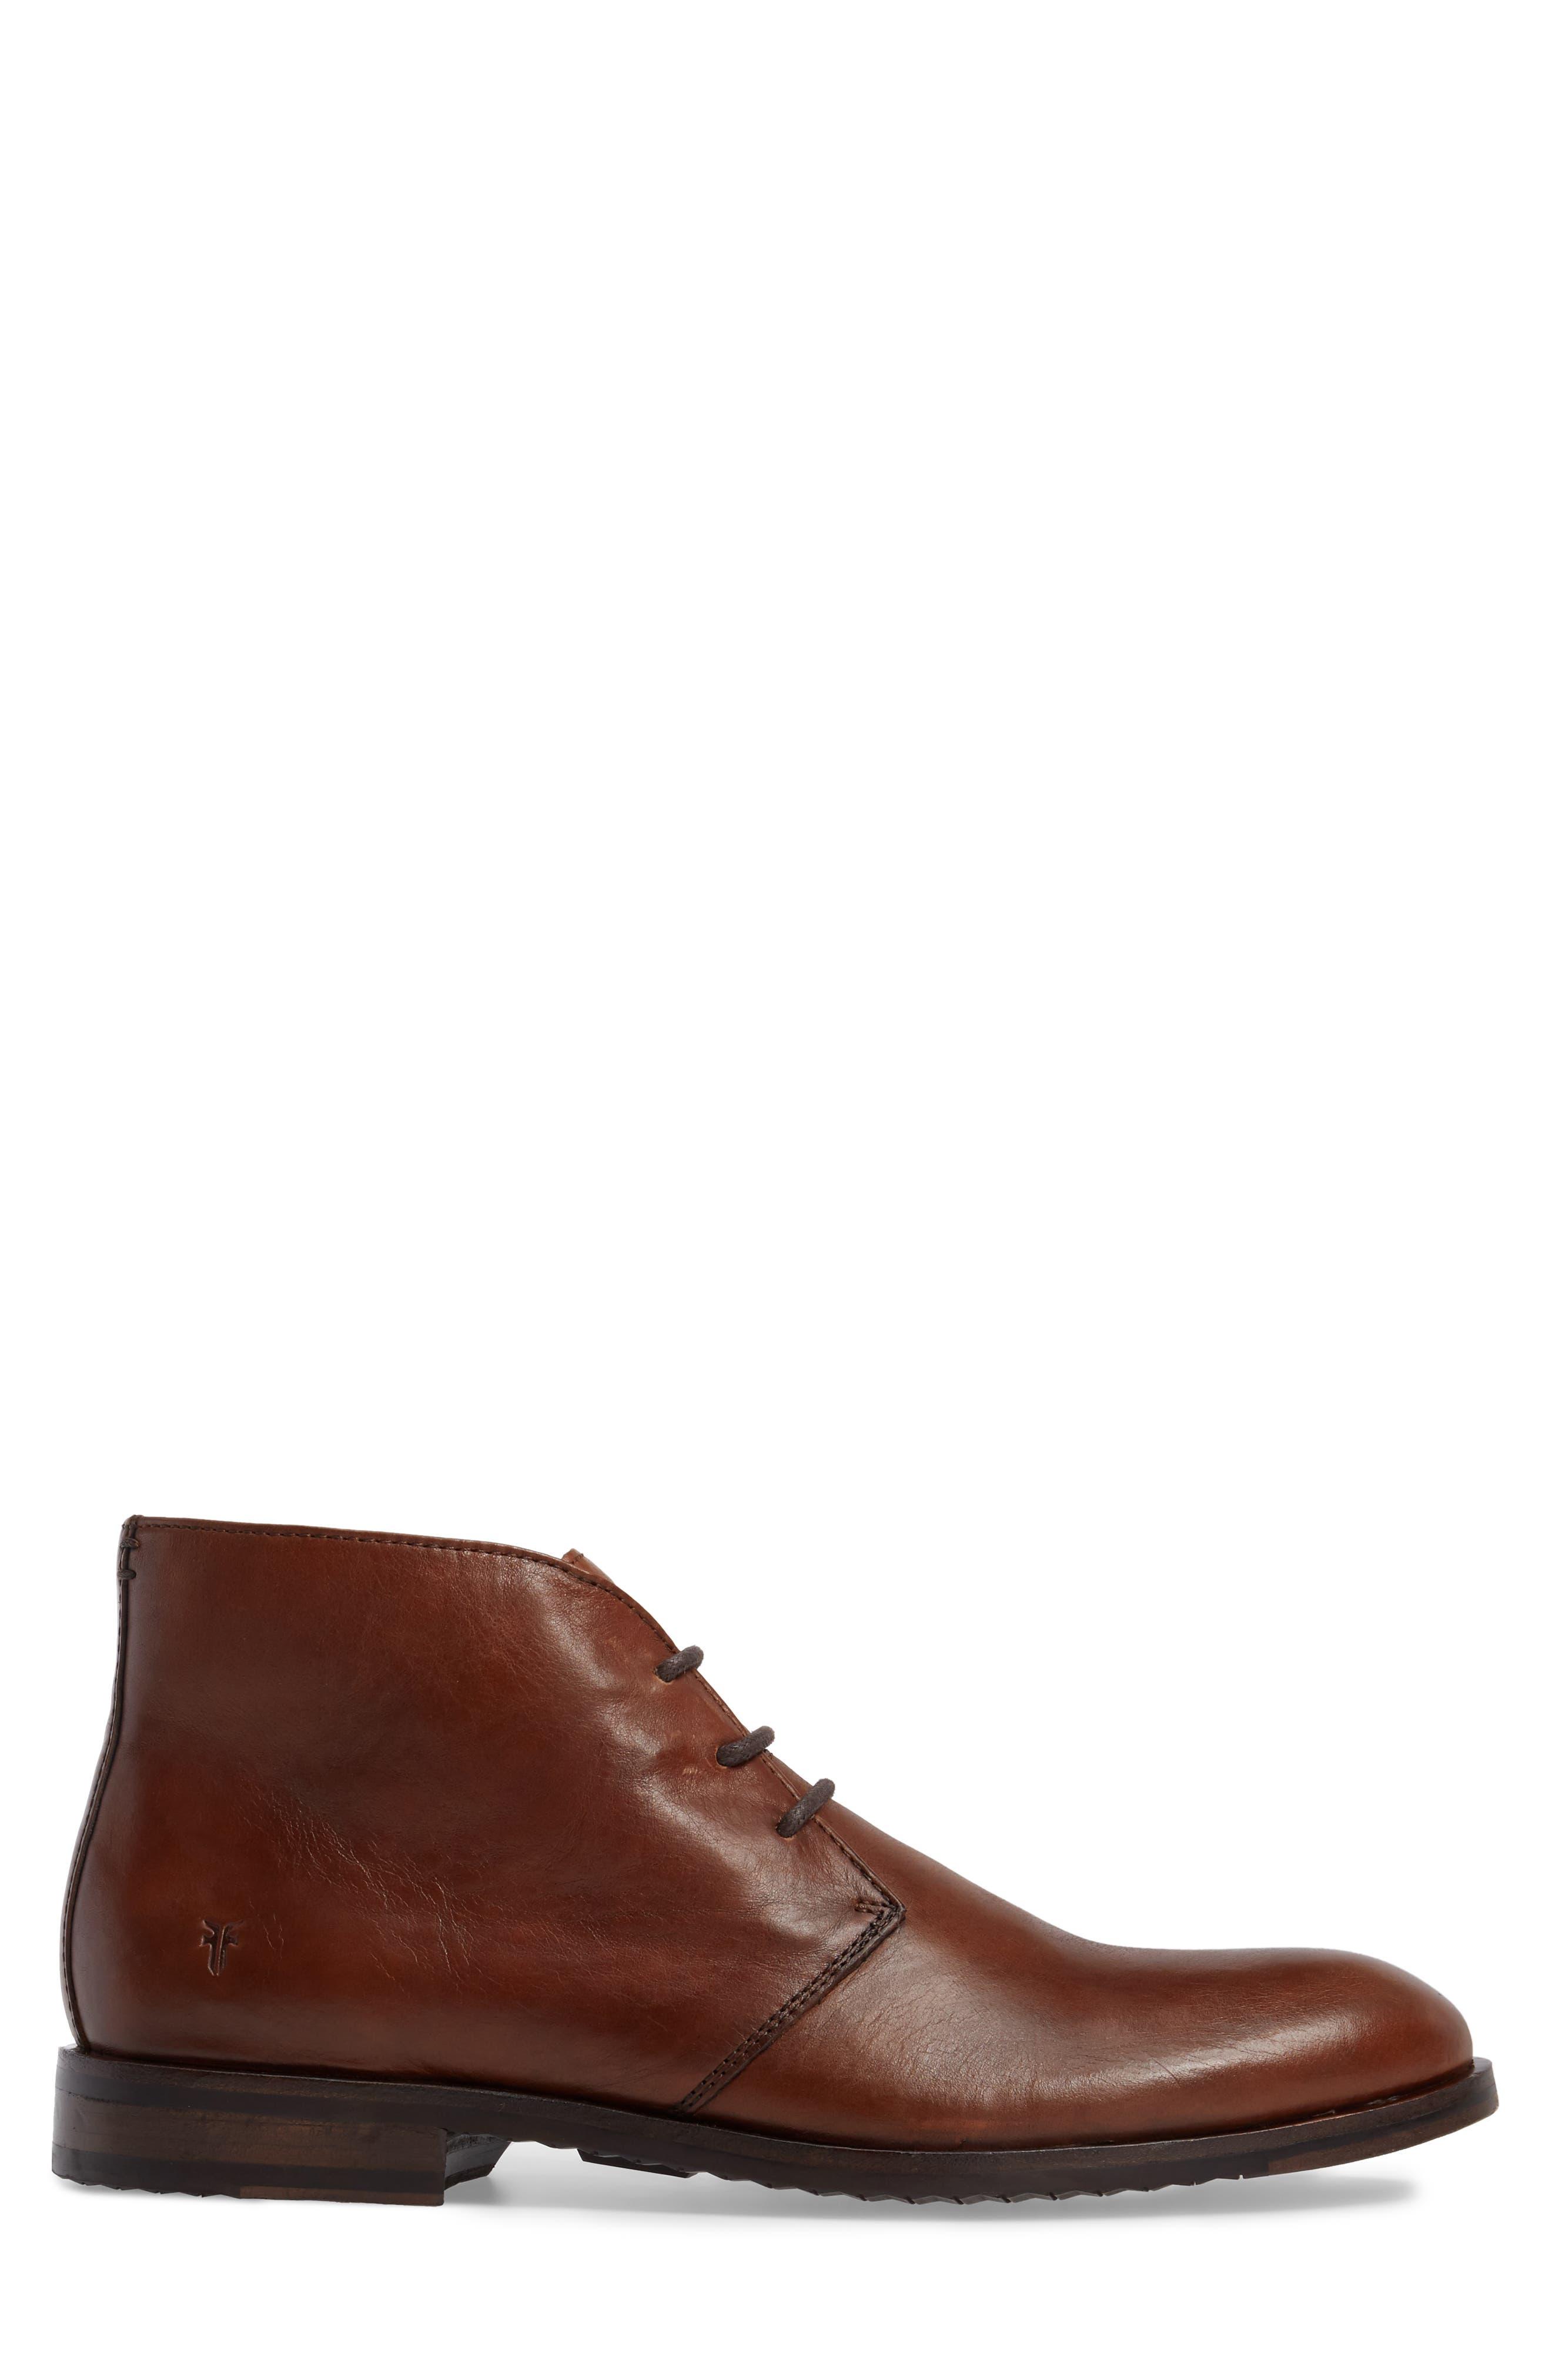 Sam Chukka Boot,                             Alternate thumbnail 3, color,                             Cognac Leather